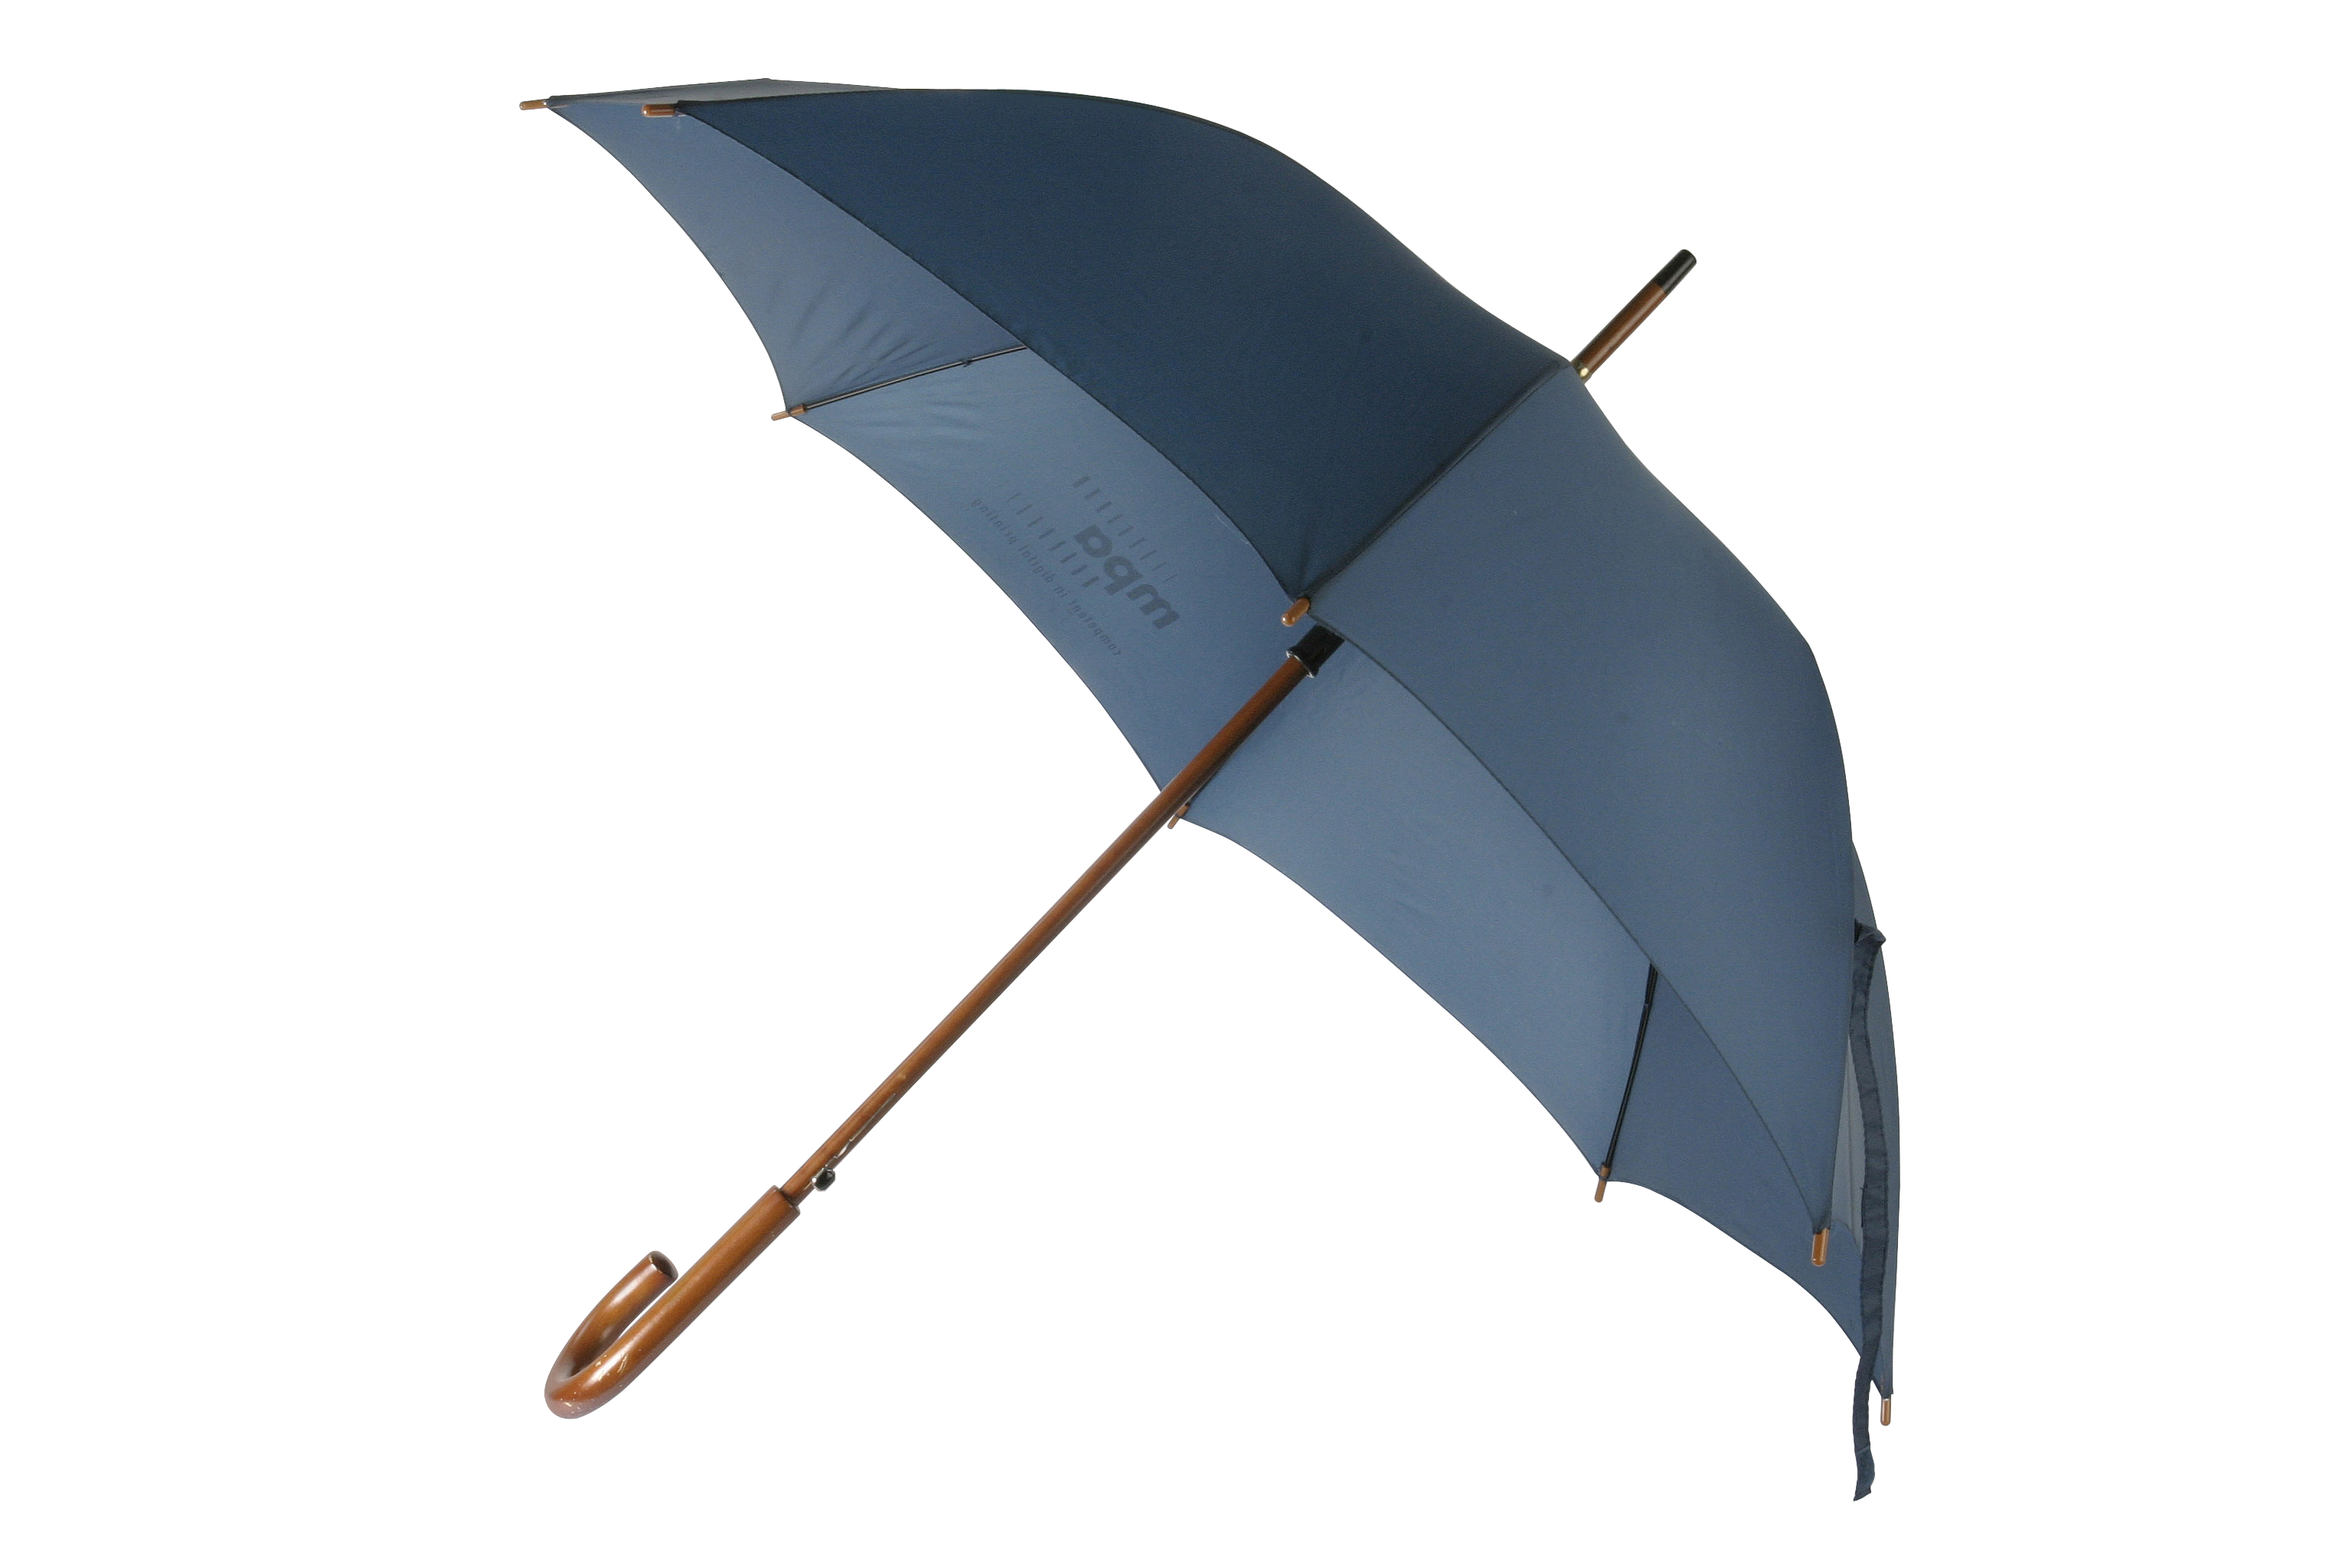 Wooden barrels 1 png by fumar porros on deviantart - Free Png Umbrella By Absurdwordpreferred Deviantart Com